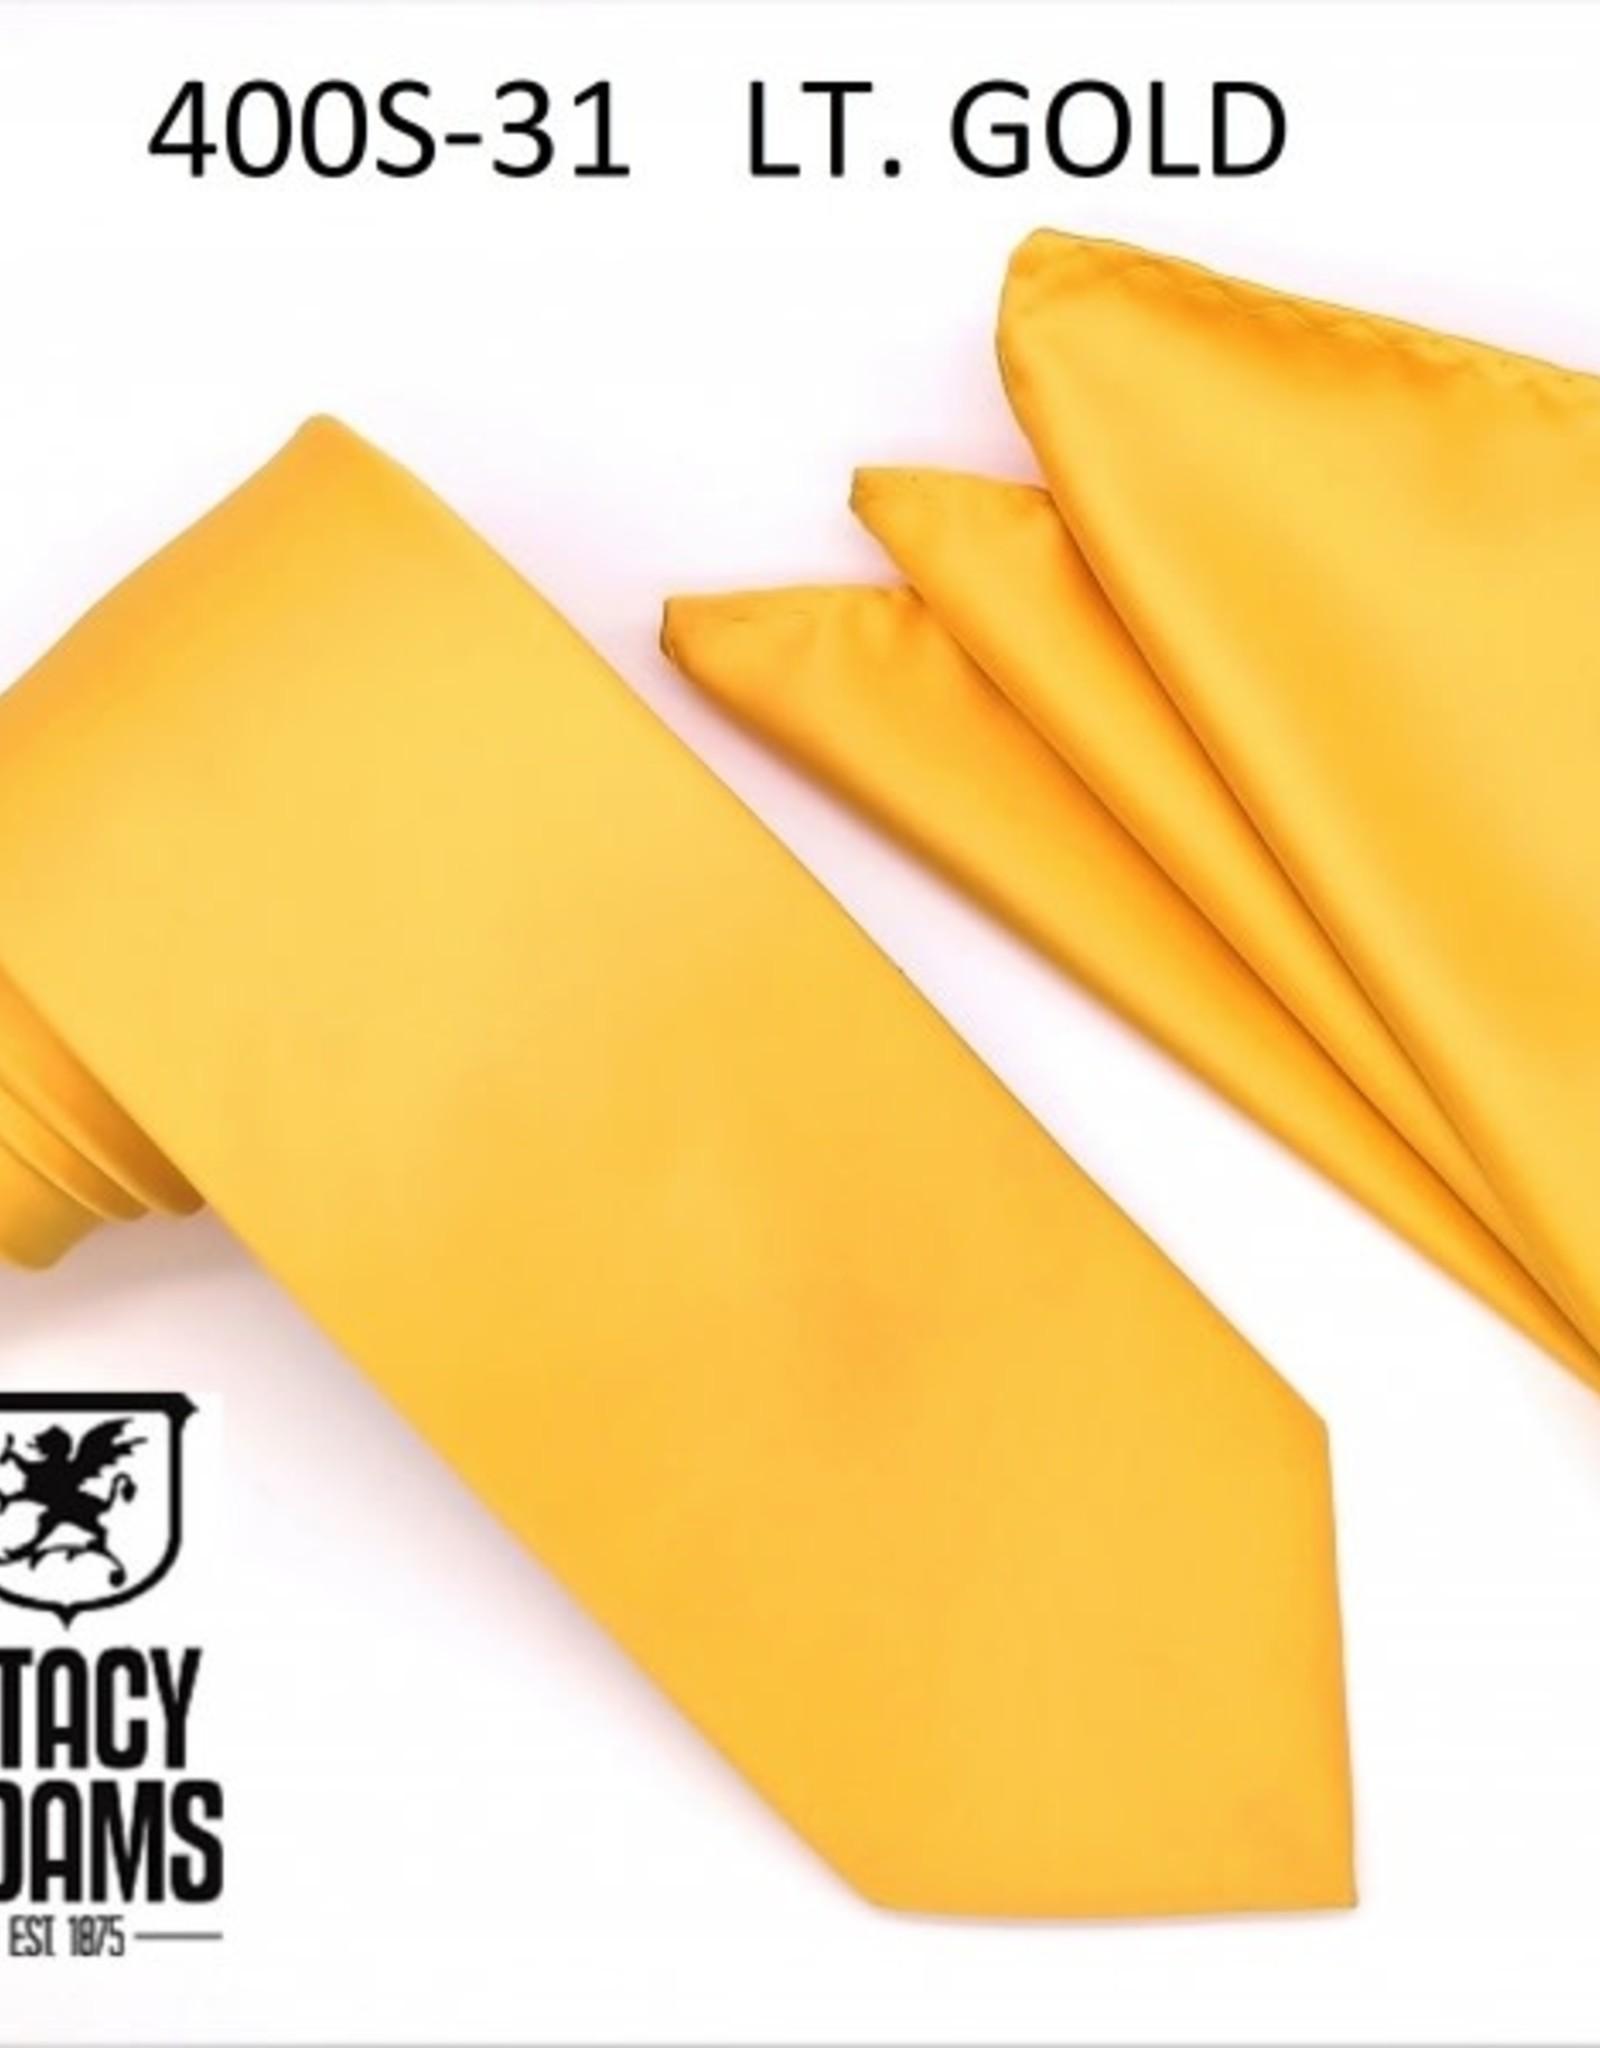 Stacy Adams Tie Stacy Adams Reg 400S-31 Gold